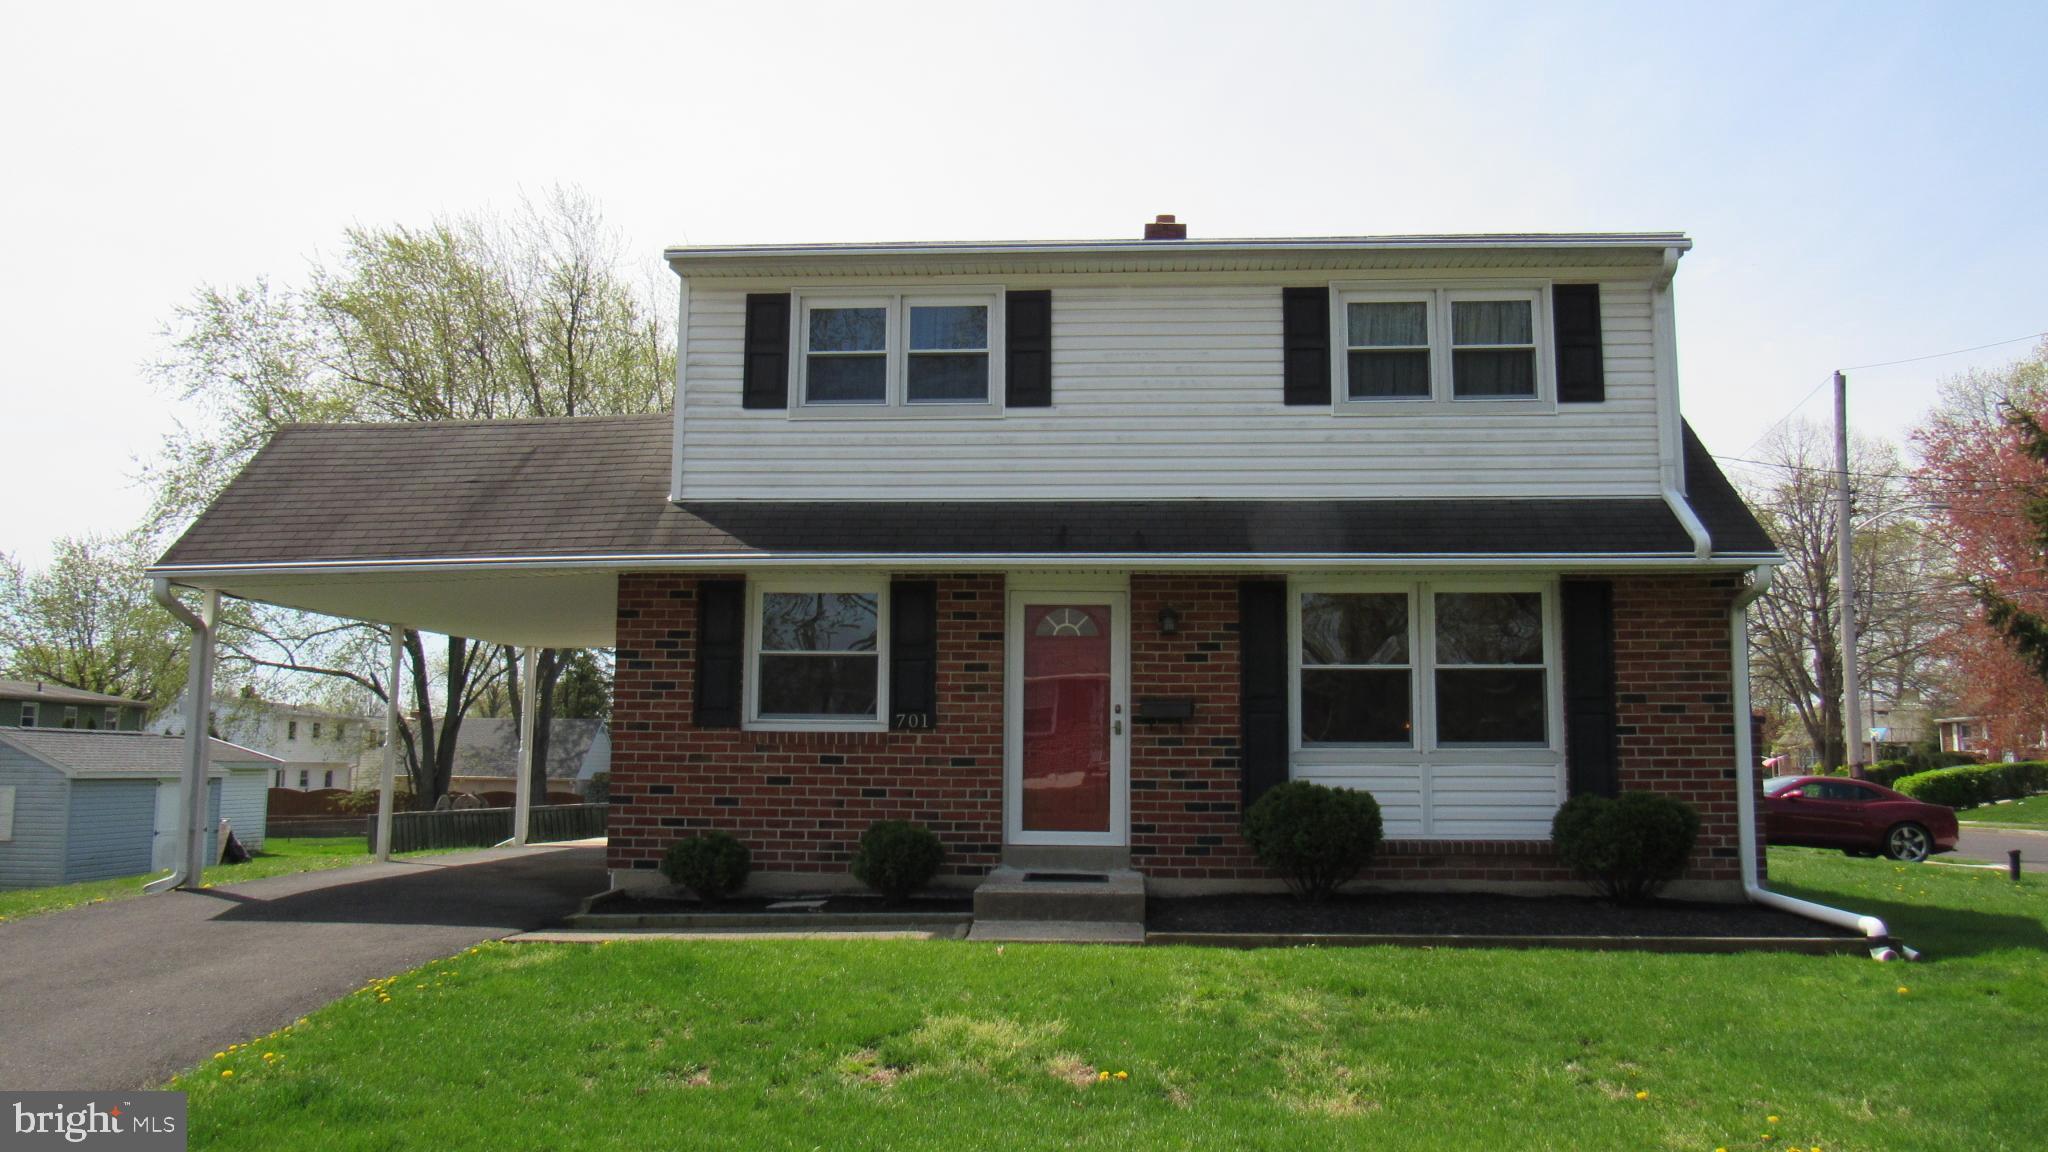 701 CYPRESS STREET, LANSDALE, Pennsylvania 19446, 4 Bedrooms Bedrooms, ,2 BathroomsBathrooms,Single Family,For Sale,701 CYPRESS STREET,PAMC690688